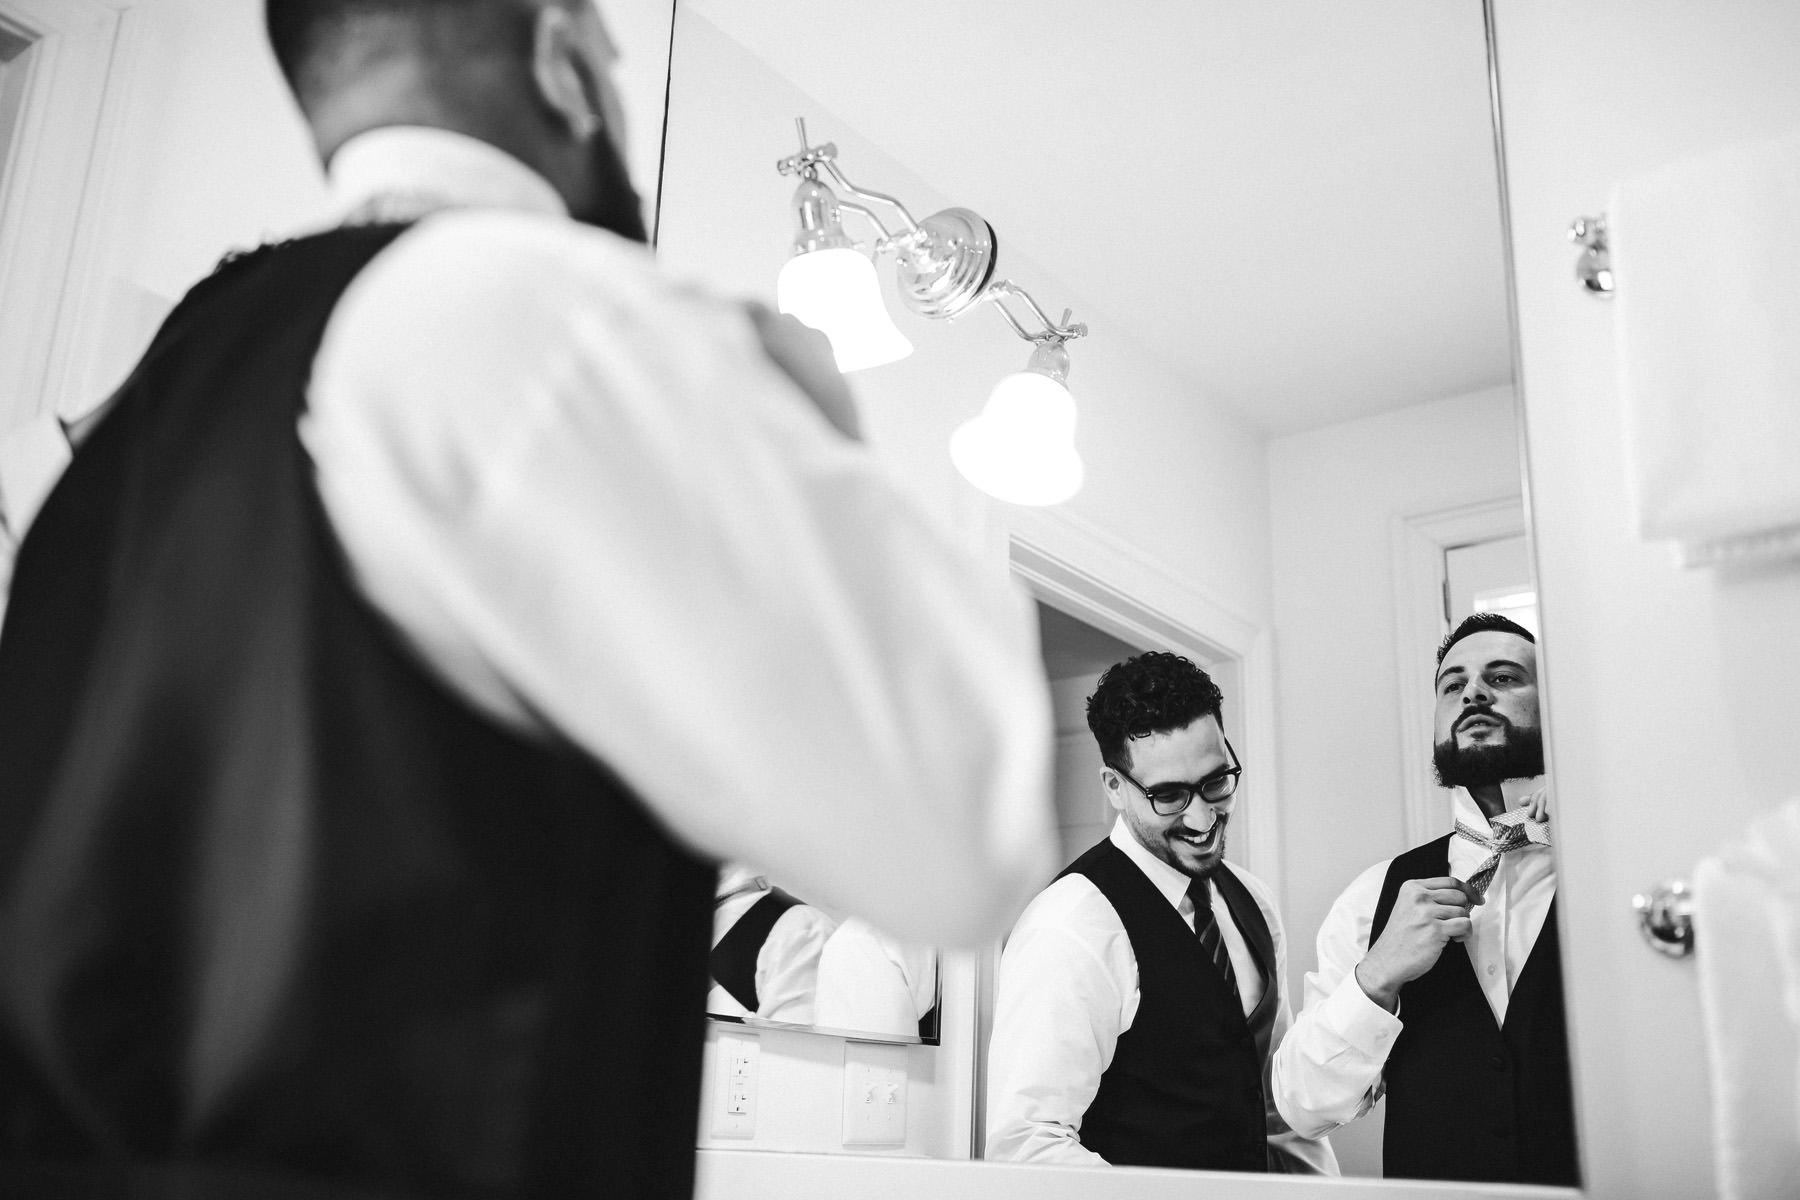 getting-ready-for-wedding-groom-tiny-house-photo.jpg